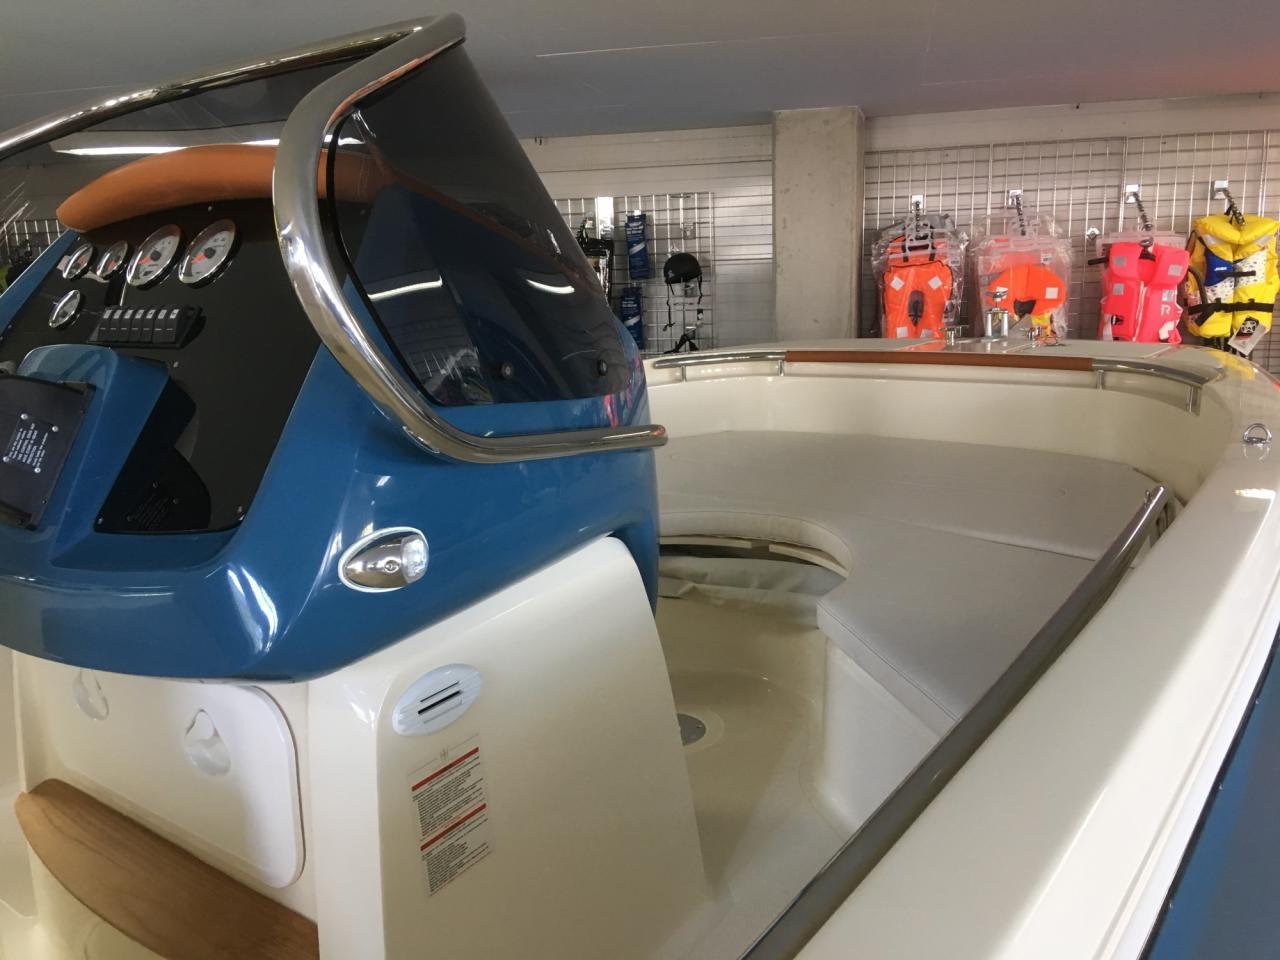 Invictus 200 fx blue whale met Suzuki 140 pk 13